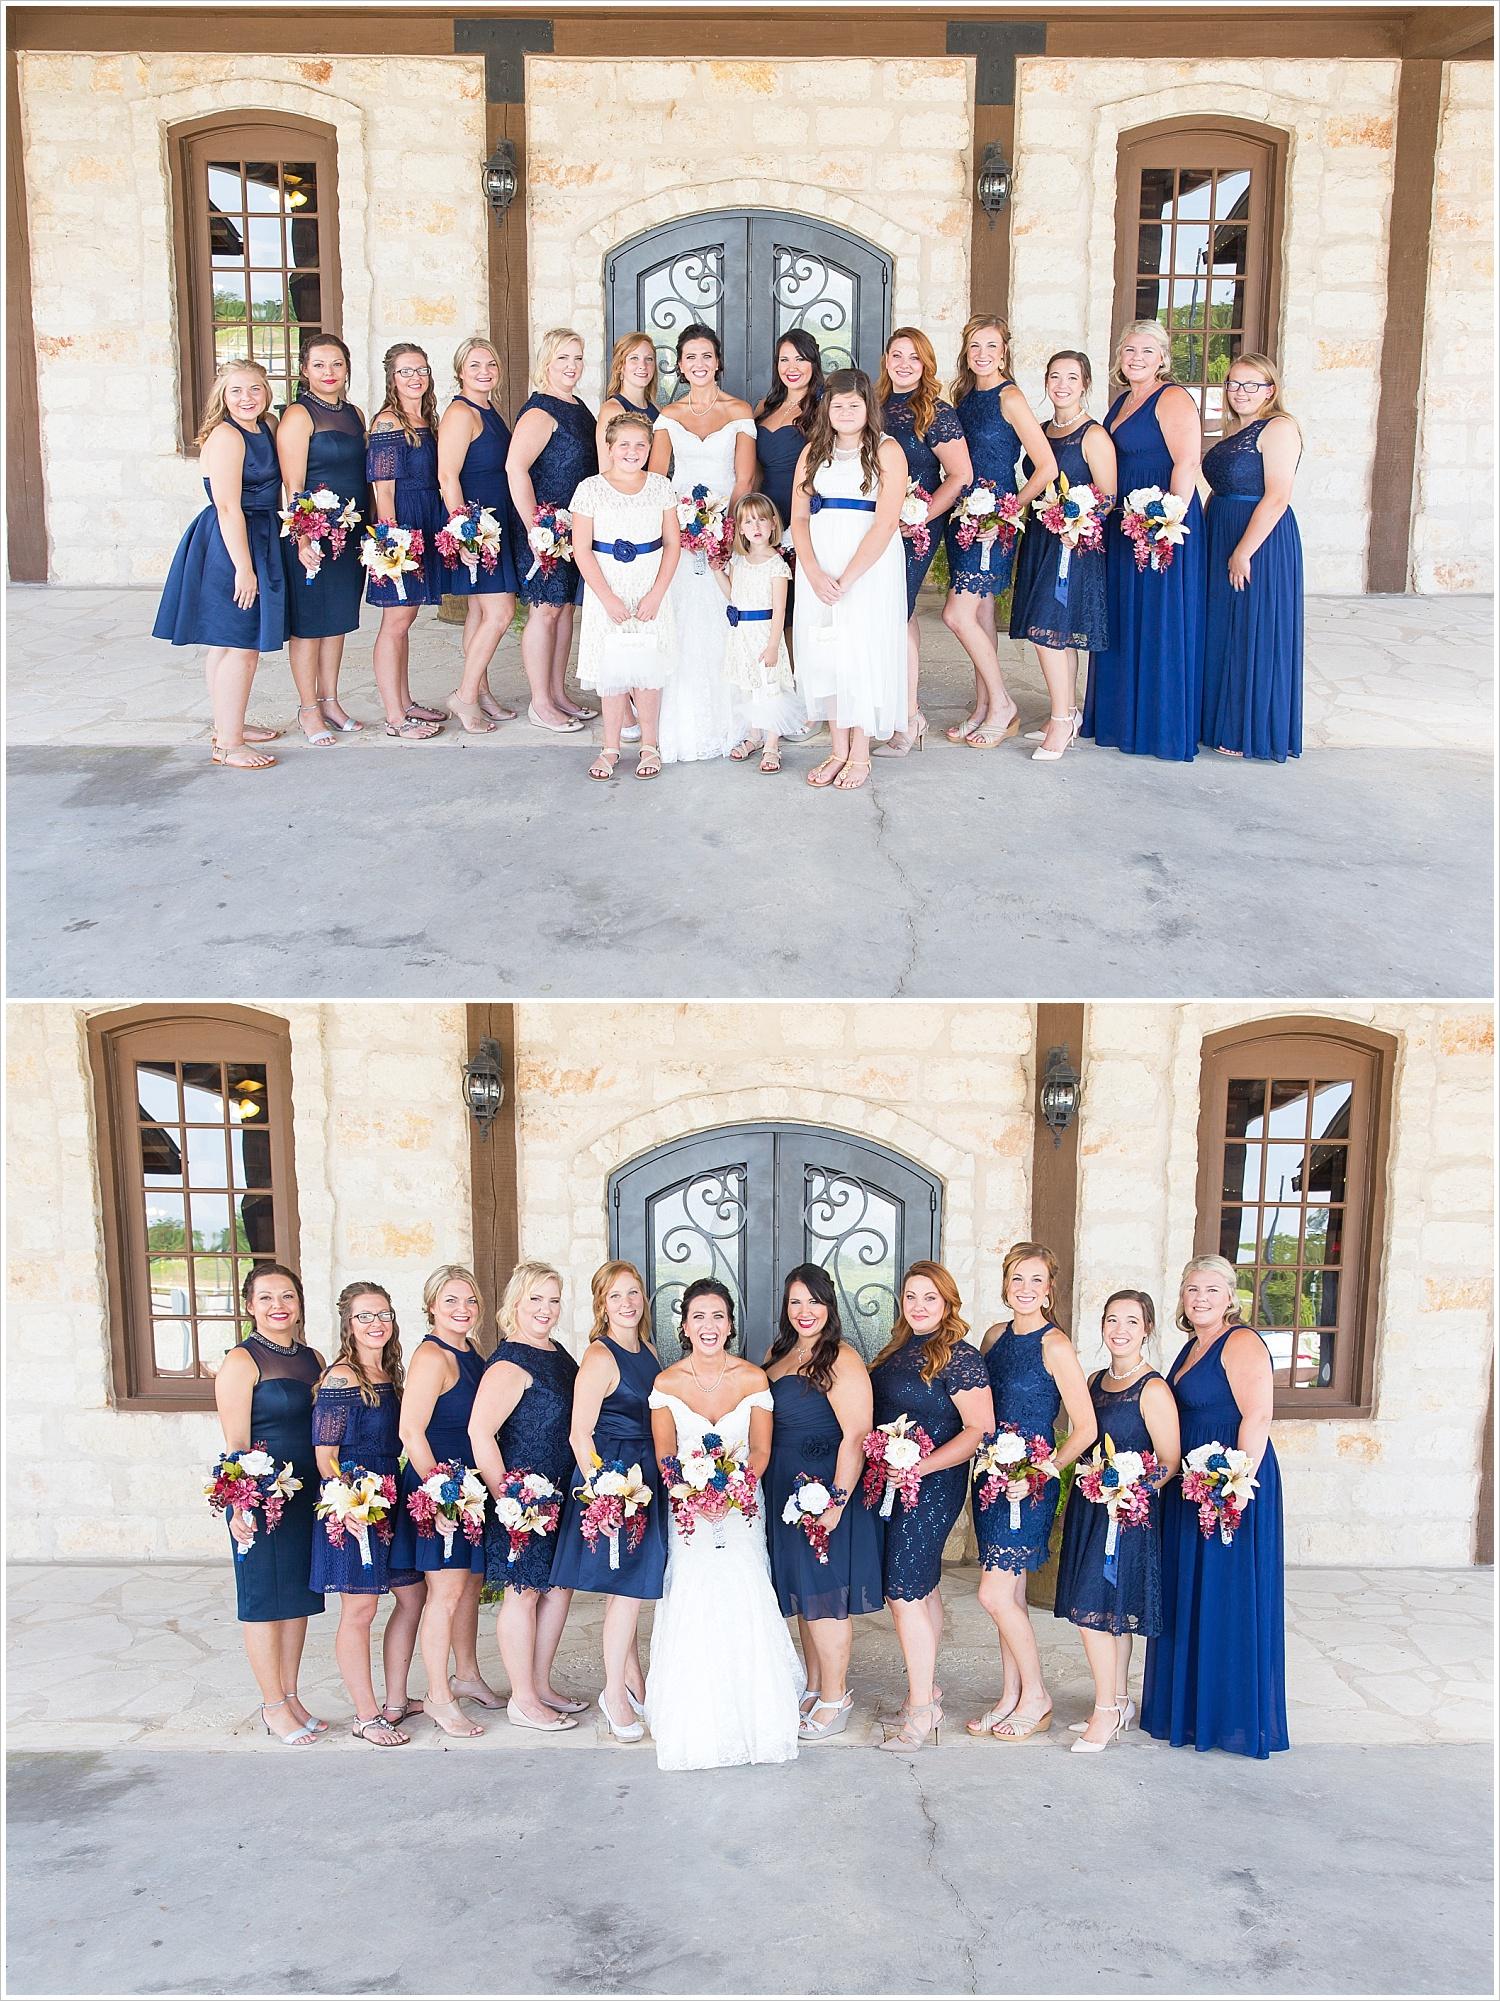 Bridal party,summer blush and navy wedding at Stone Hall at The Springs in McKinney, Texas, Jason & Melaina Photography, www.jasonandmelaina.com